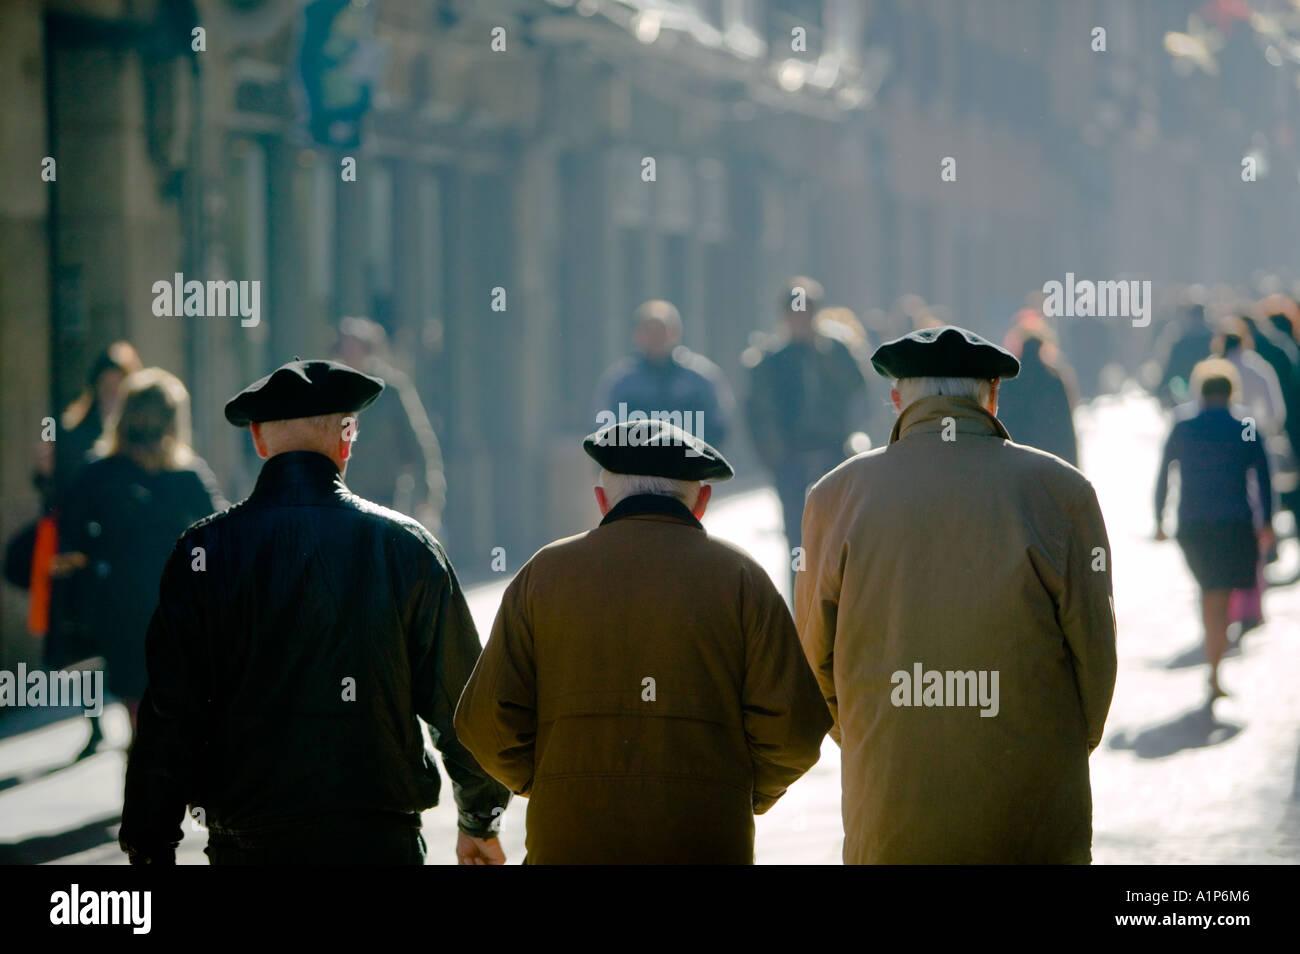 Three elderly gentlemen wearing black Basque berets walking in the sunshine, Casco Viejo, Bilbao, Pais Vasco, Spain. - Stock Image